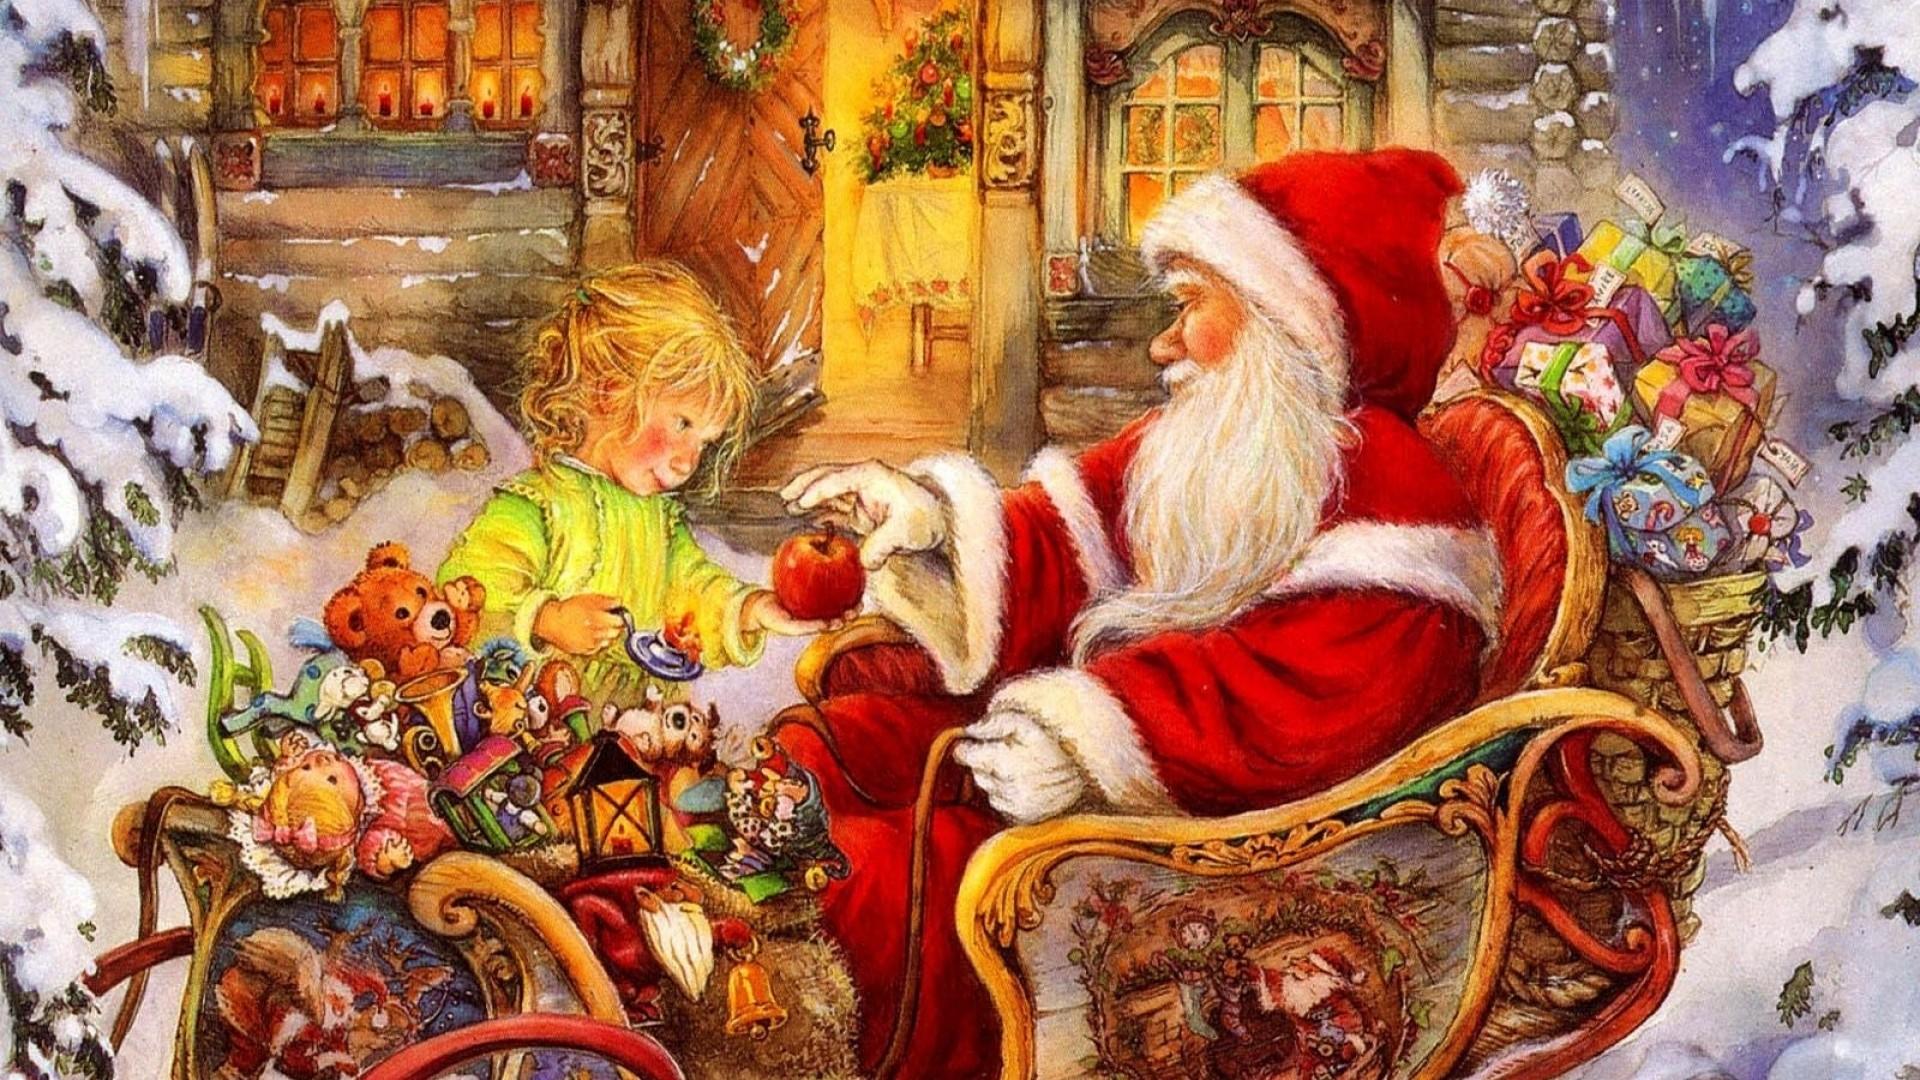 Wallpaper santa claus, sleigh, baby, apple, gifts, holiday,  christmas